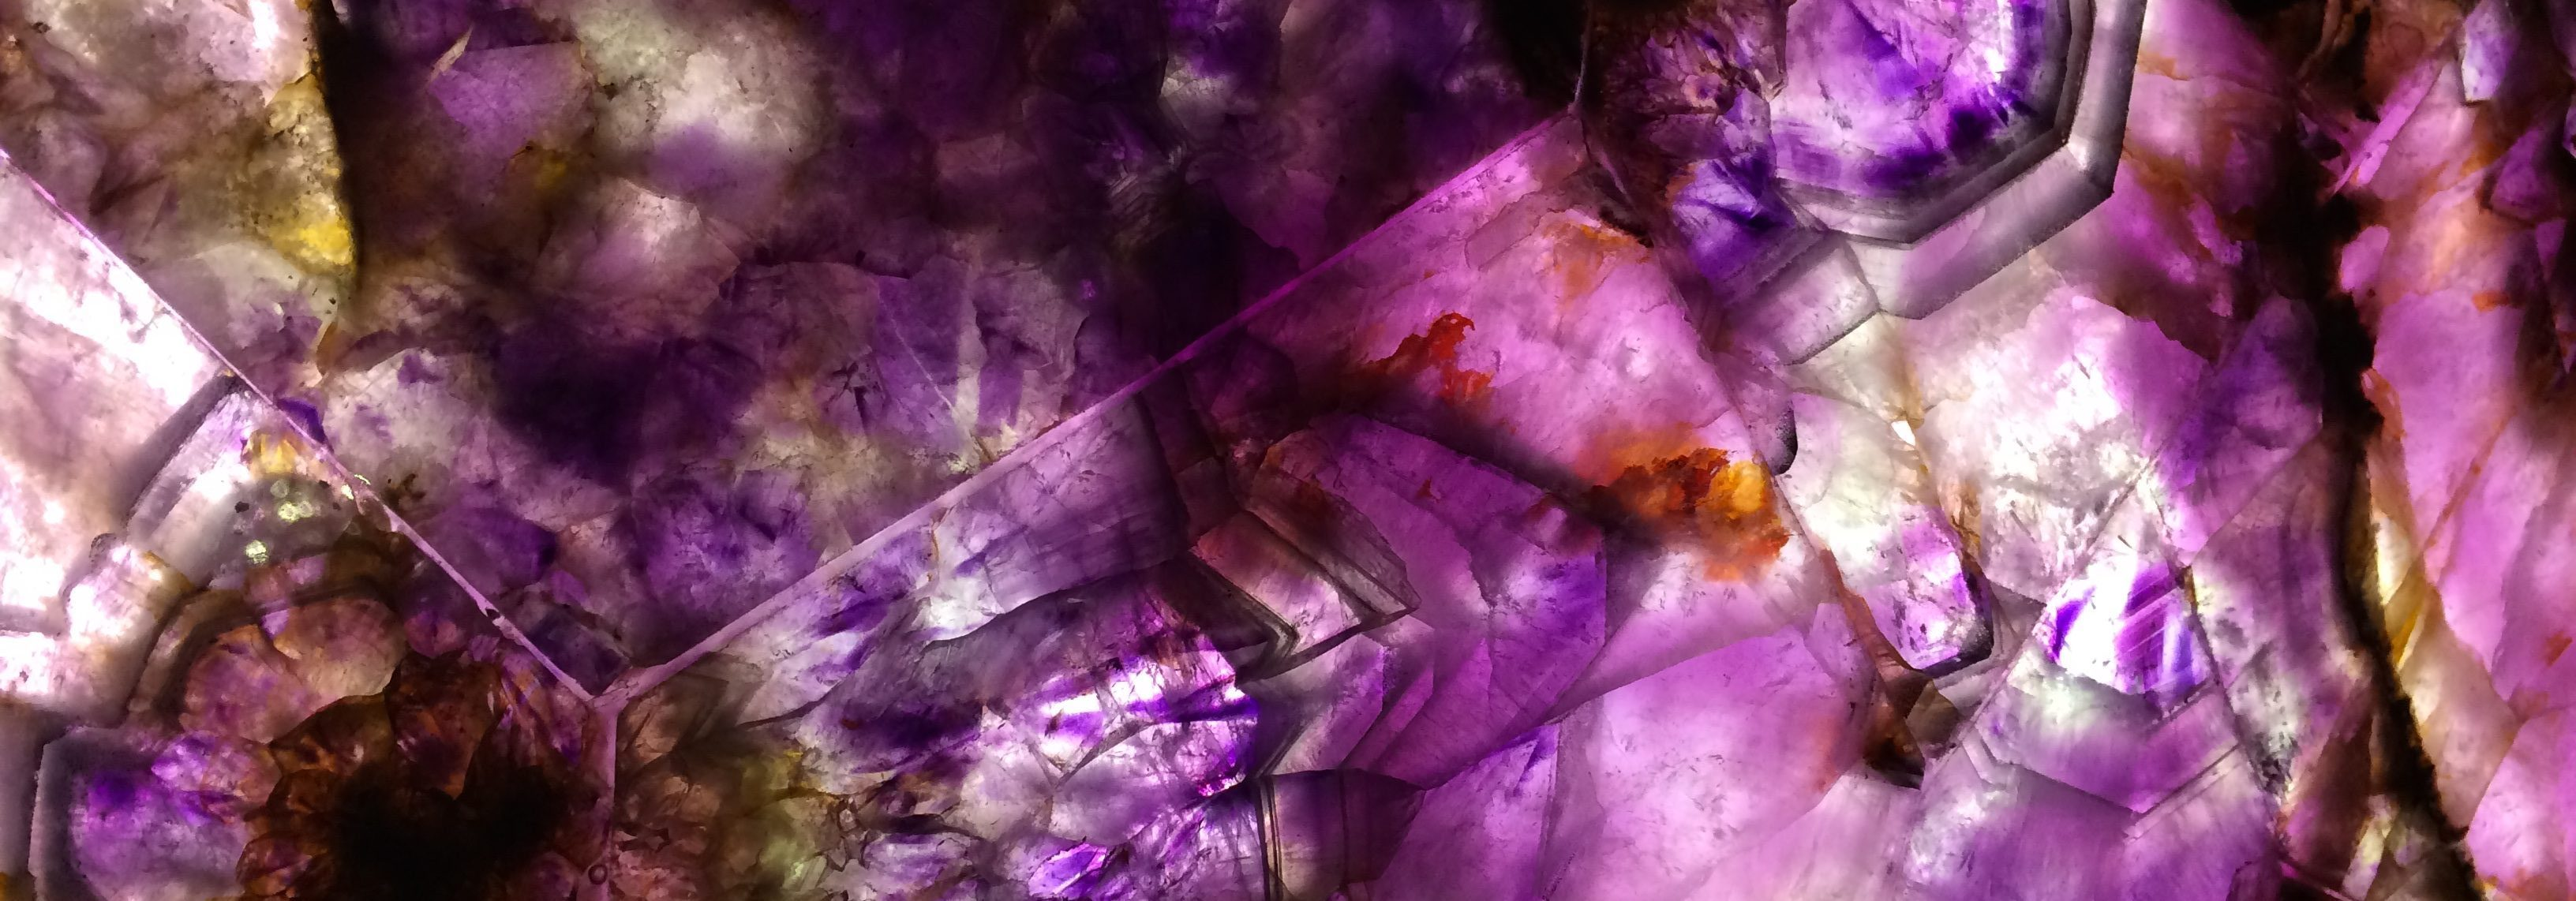 a slice of purple stone